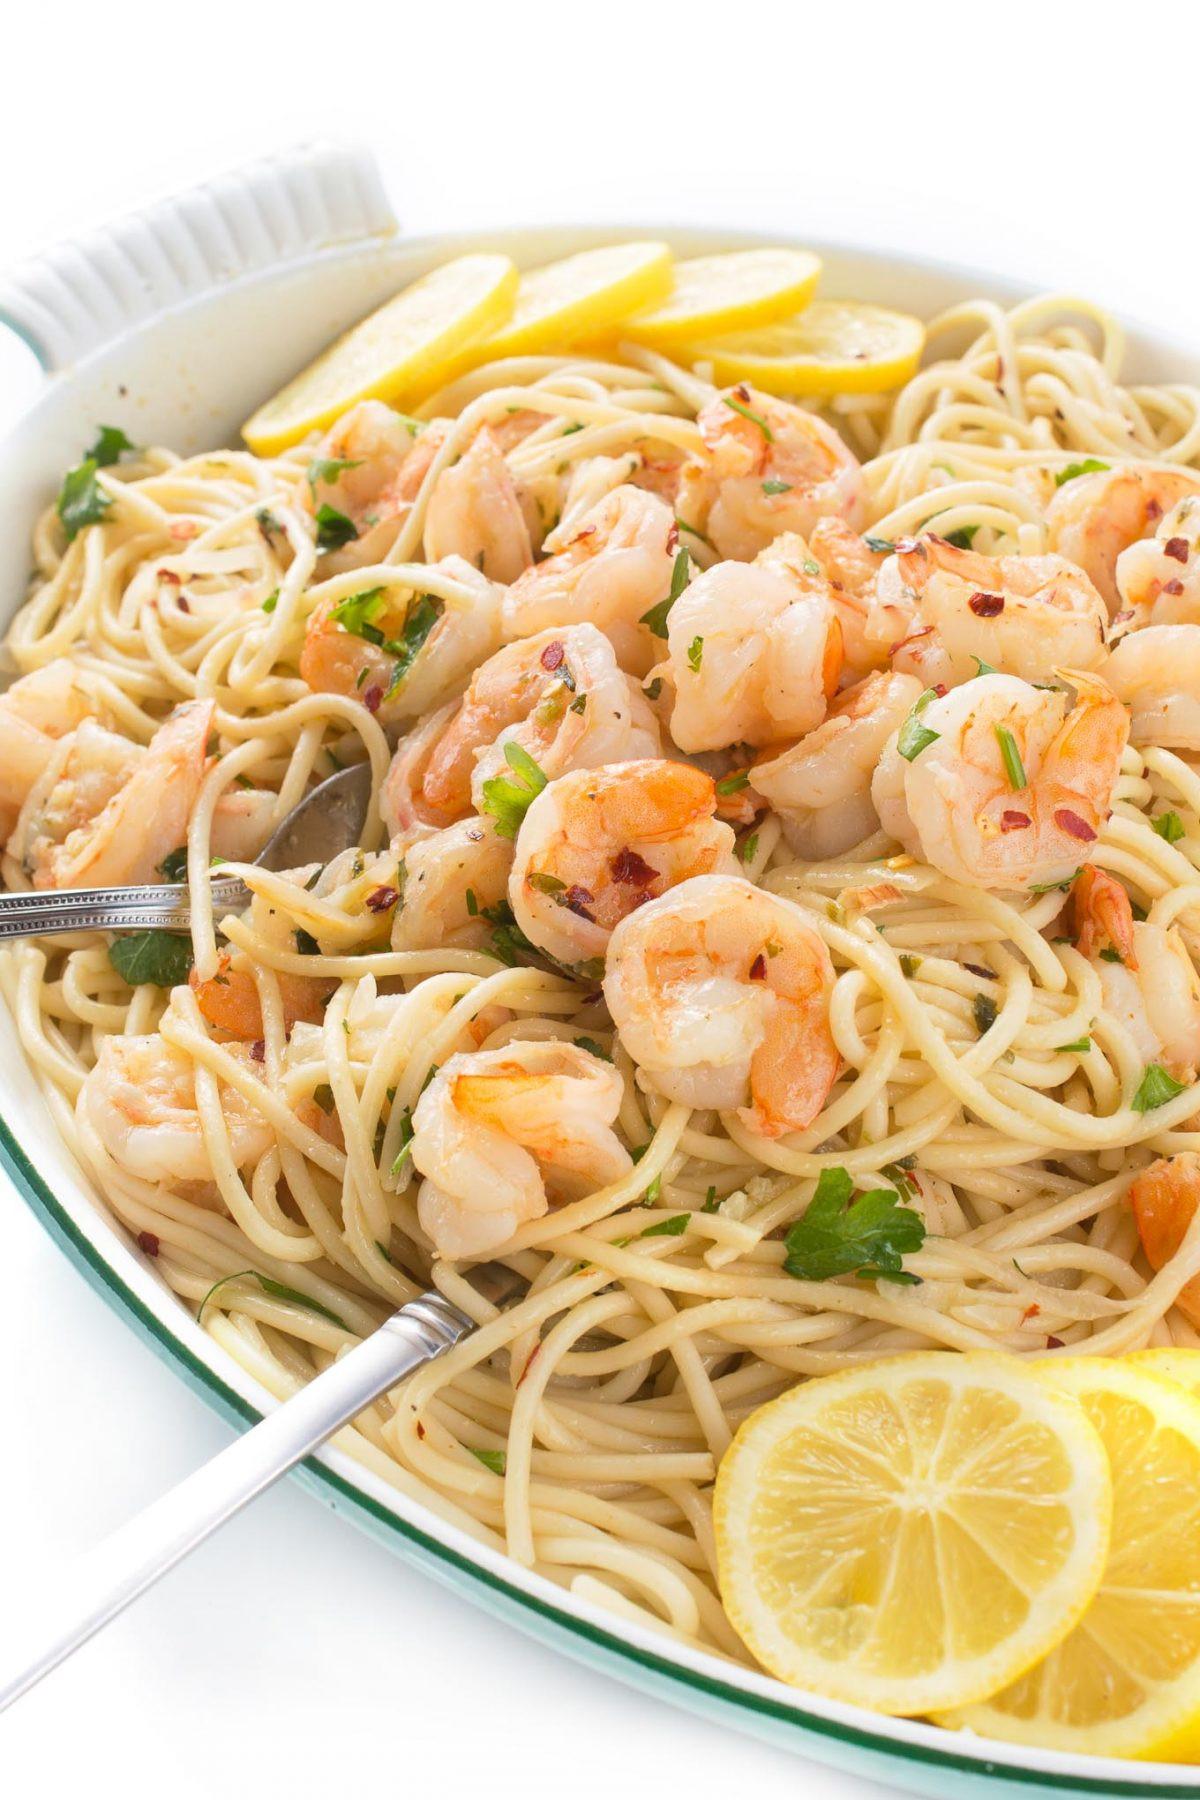 Shrimp Scampi Pasta  Shrimp Scampi with Pasta or Zoodles